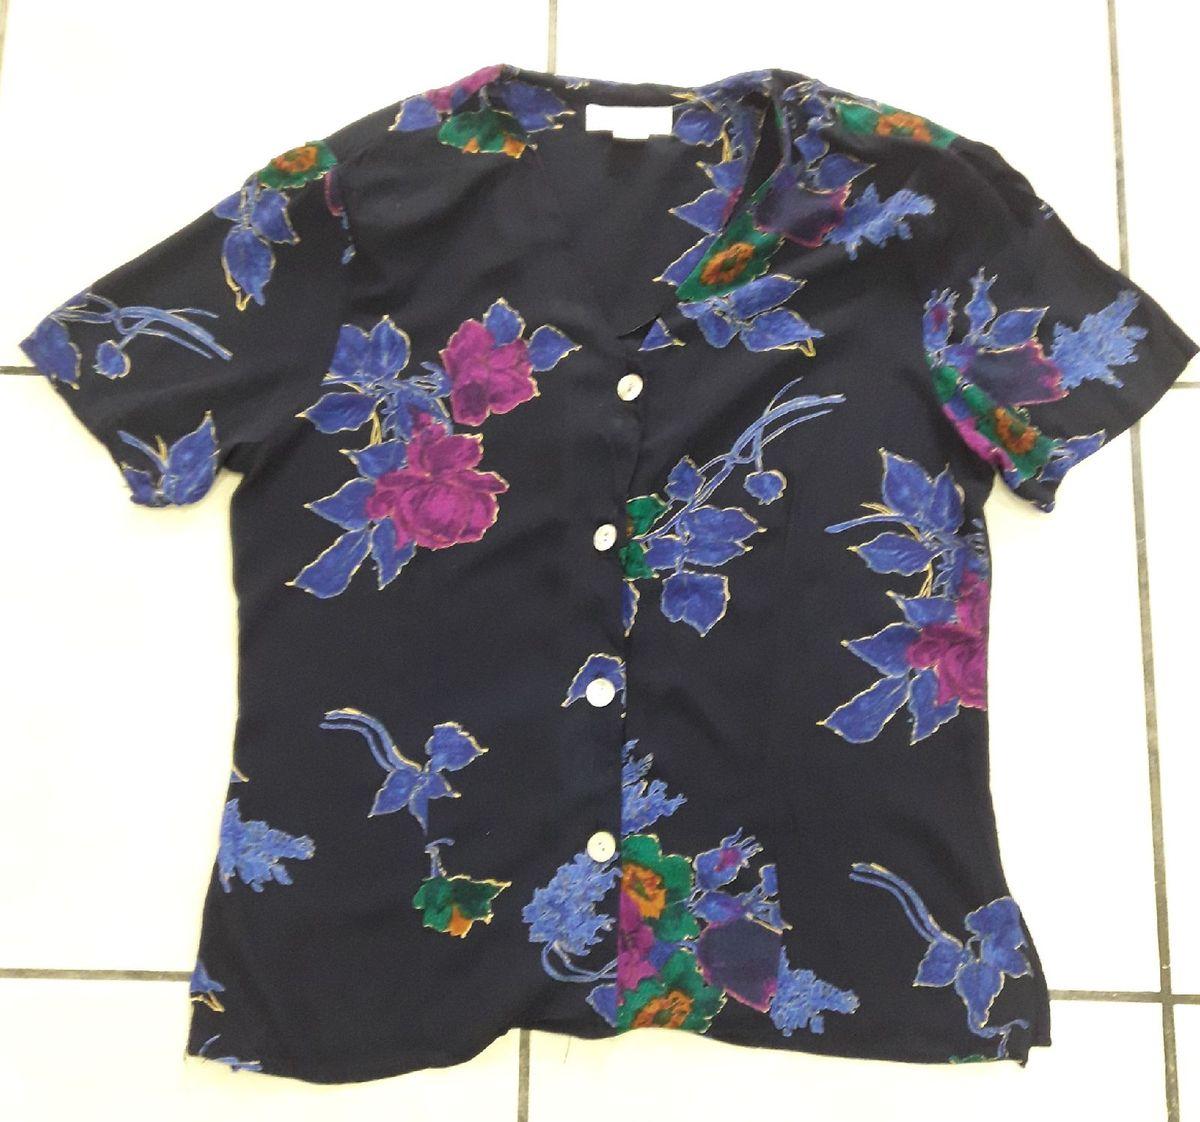 blusa florida importada (be) - blusas annex